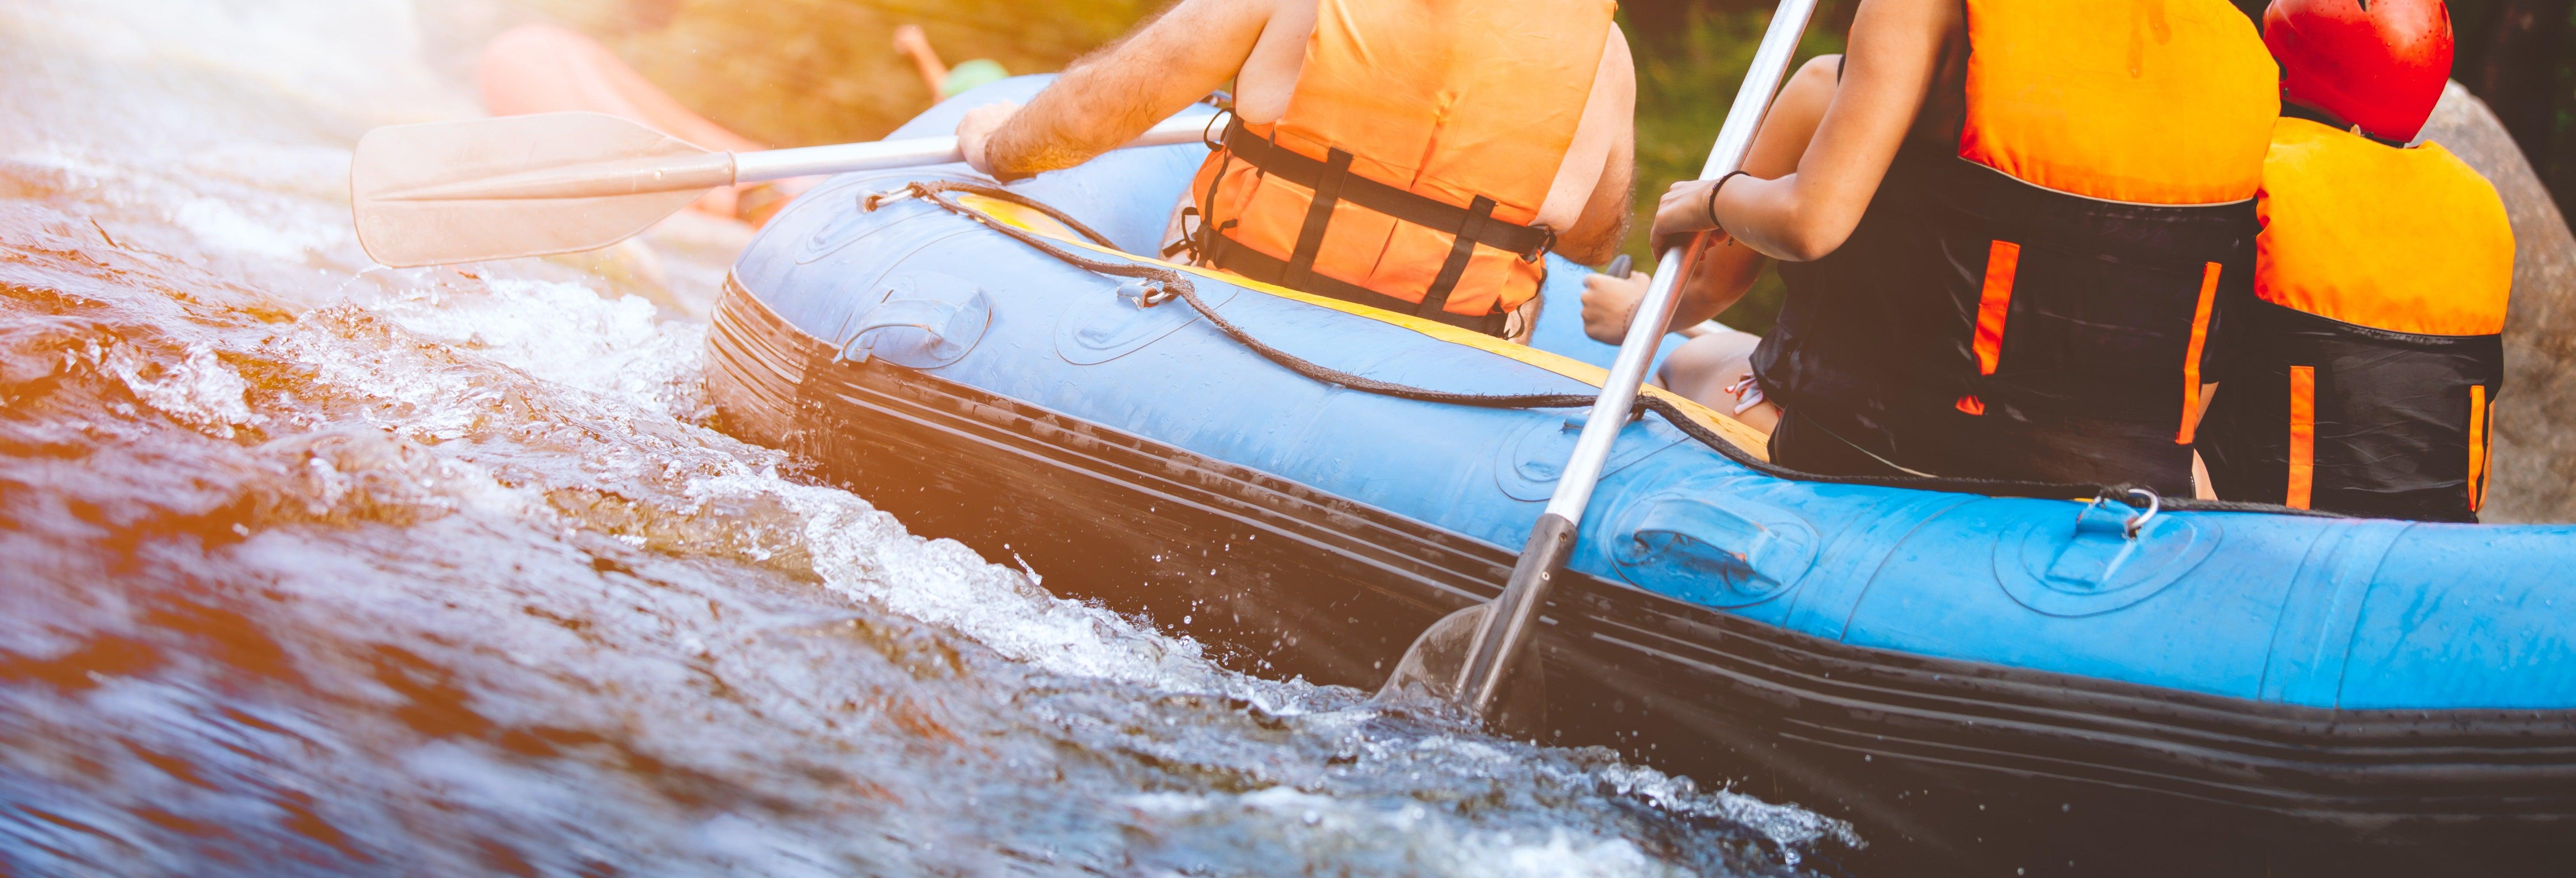 Rafting en el río Fonce